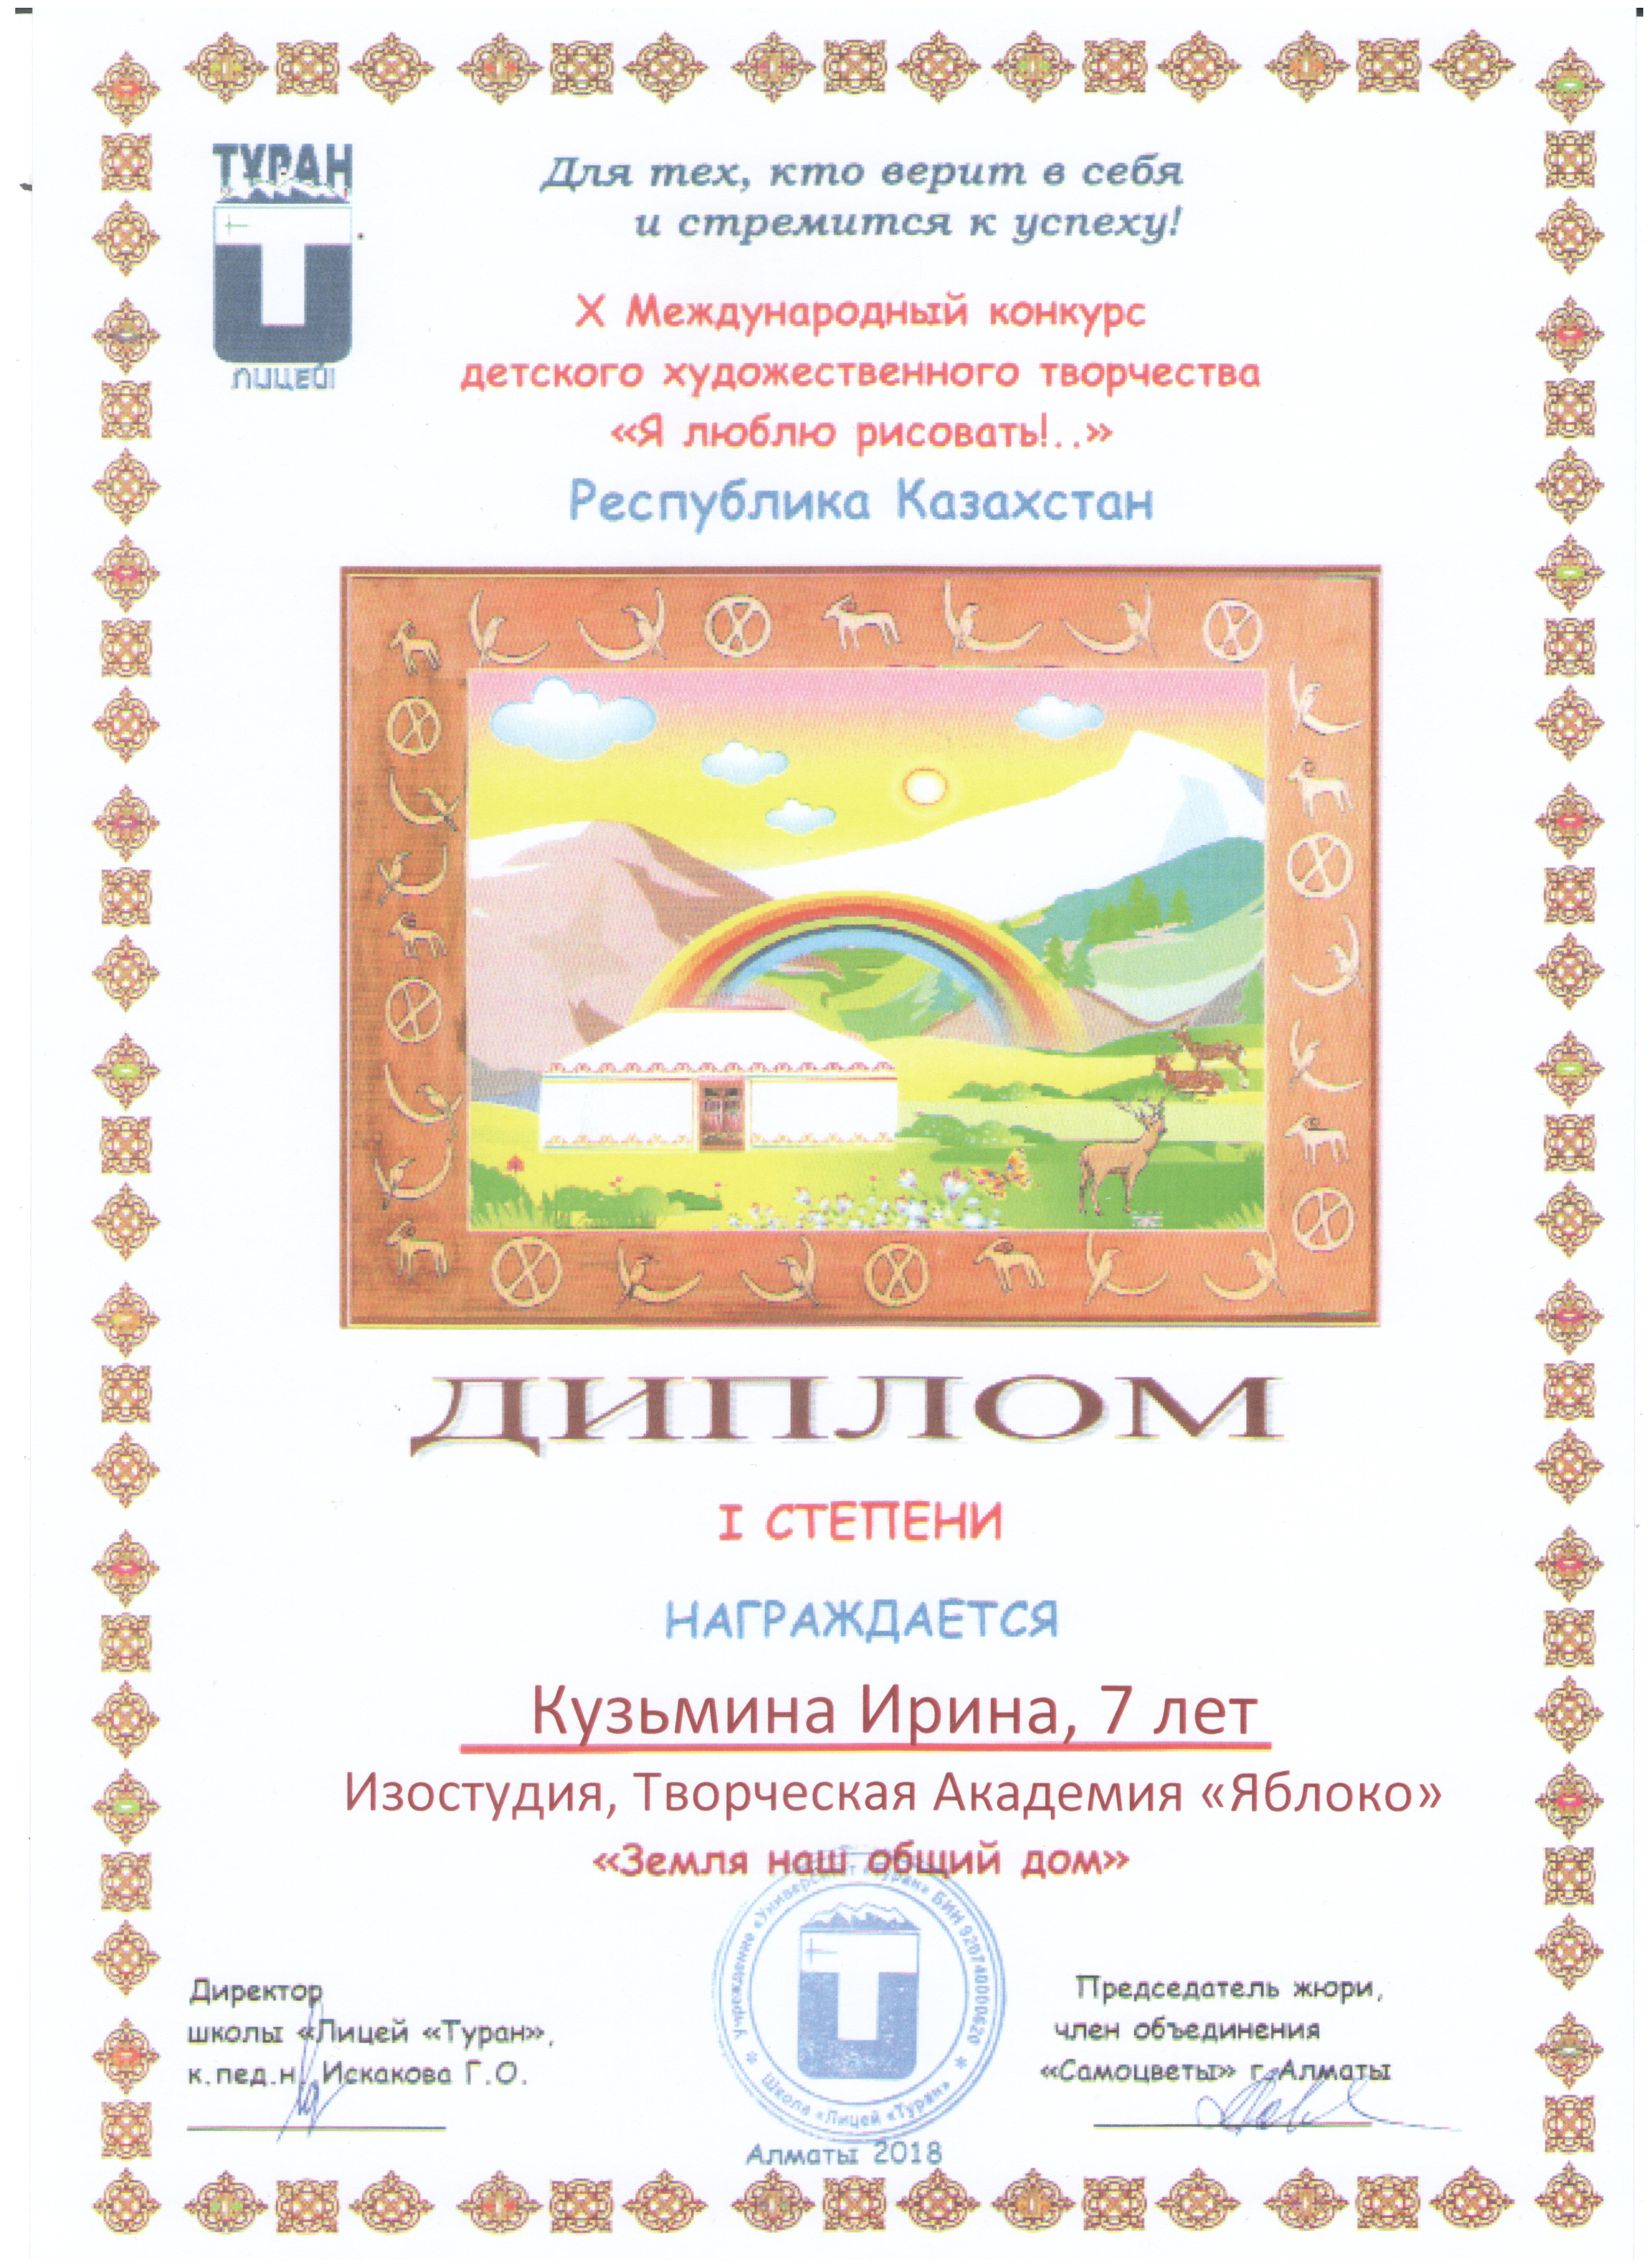 Кузьмина Ирина, 7 лет